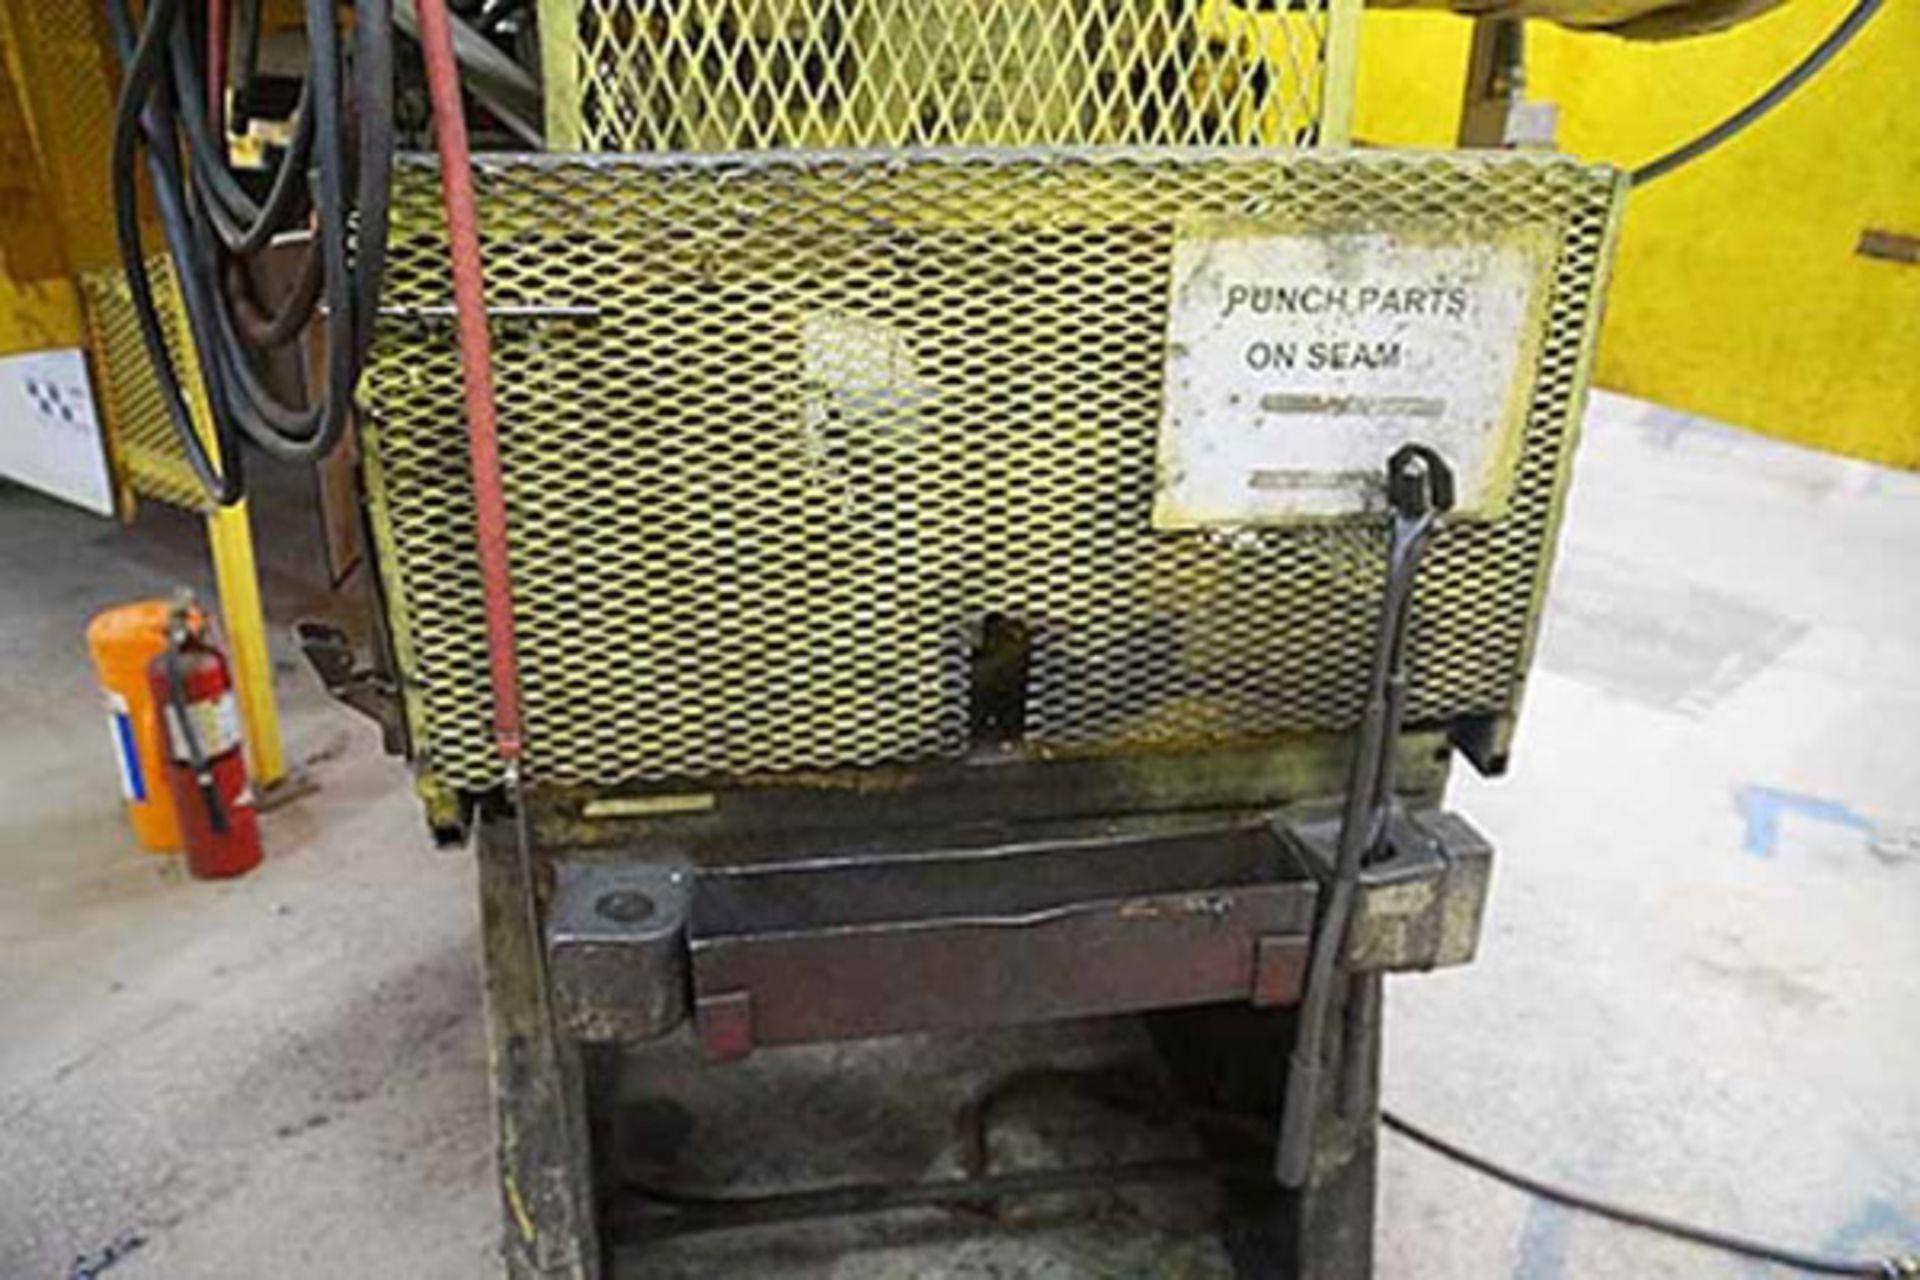 "Lot 28 - Federal OBI Punch Press | 46-Ton x 33"" x 21"", Mdl: #44, S/N: 44-469 - 6719P"